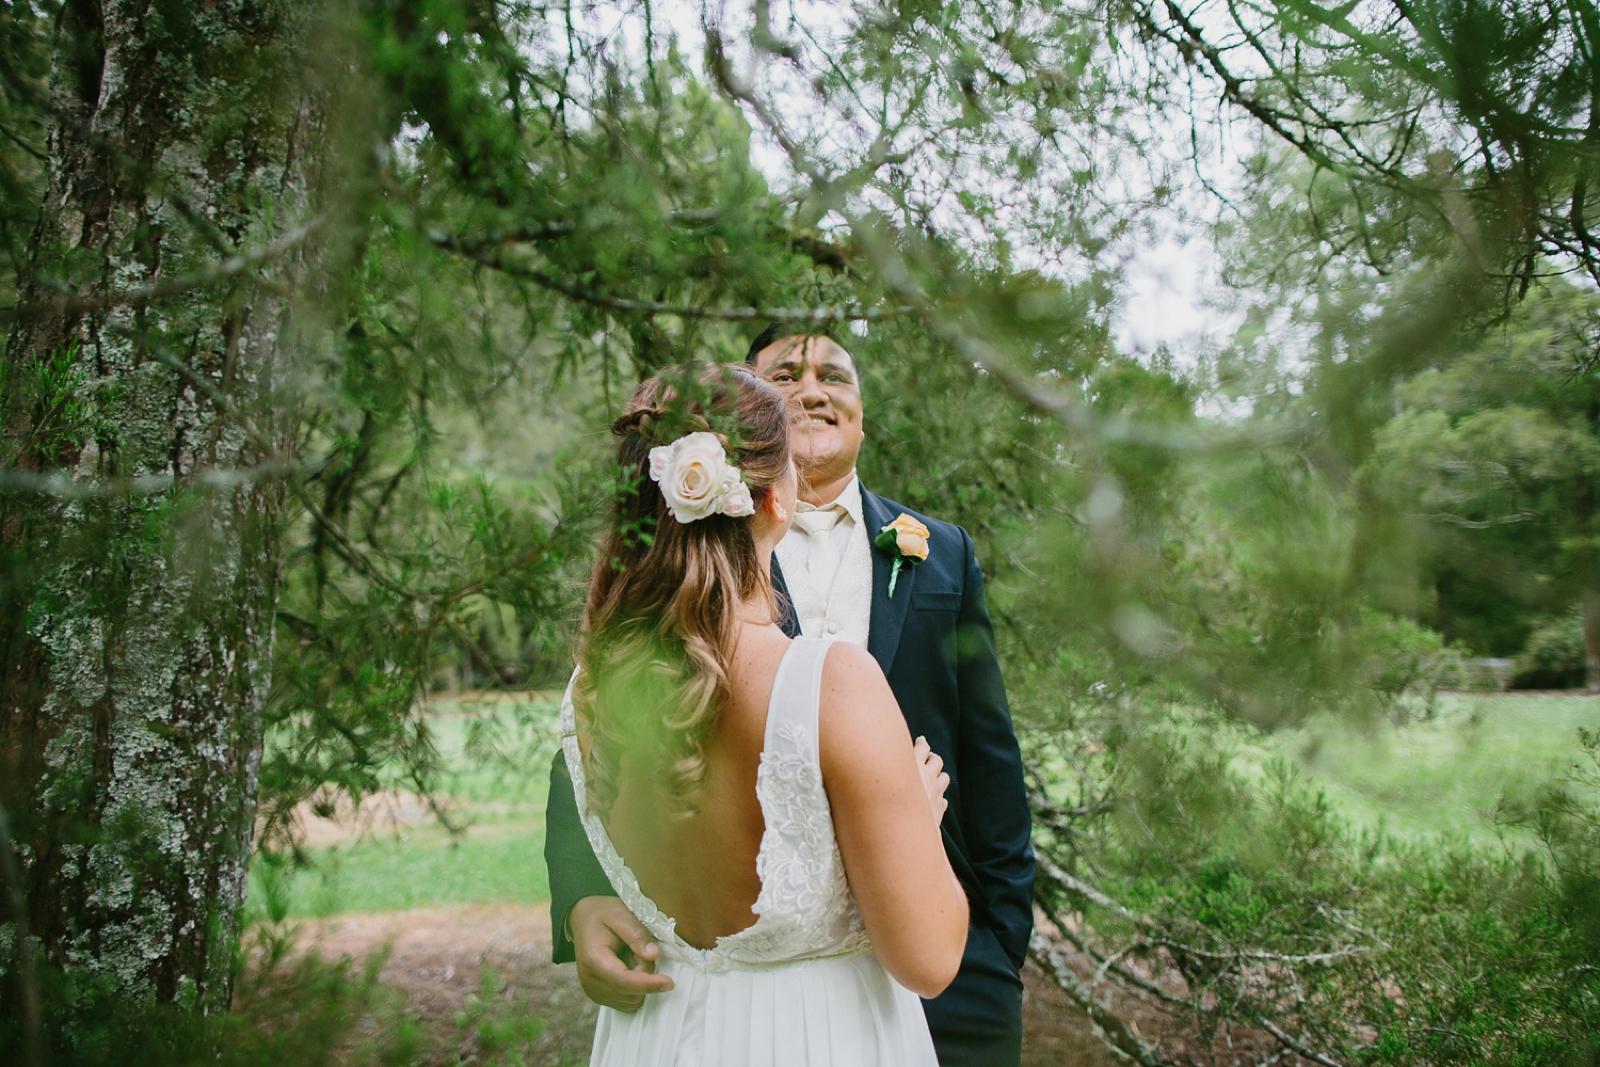 GabbyFiti_Auckland Wedding Photographer_Patty Lagera_0084.jpg